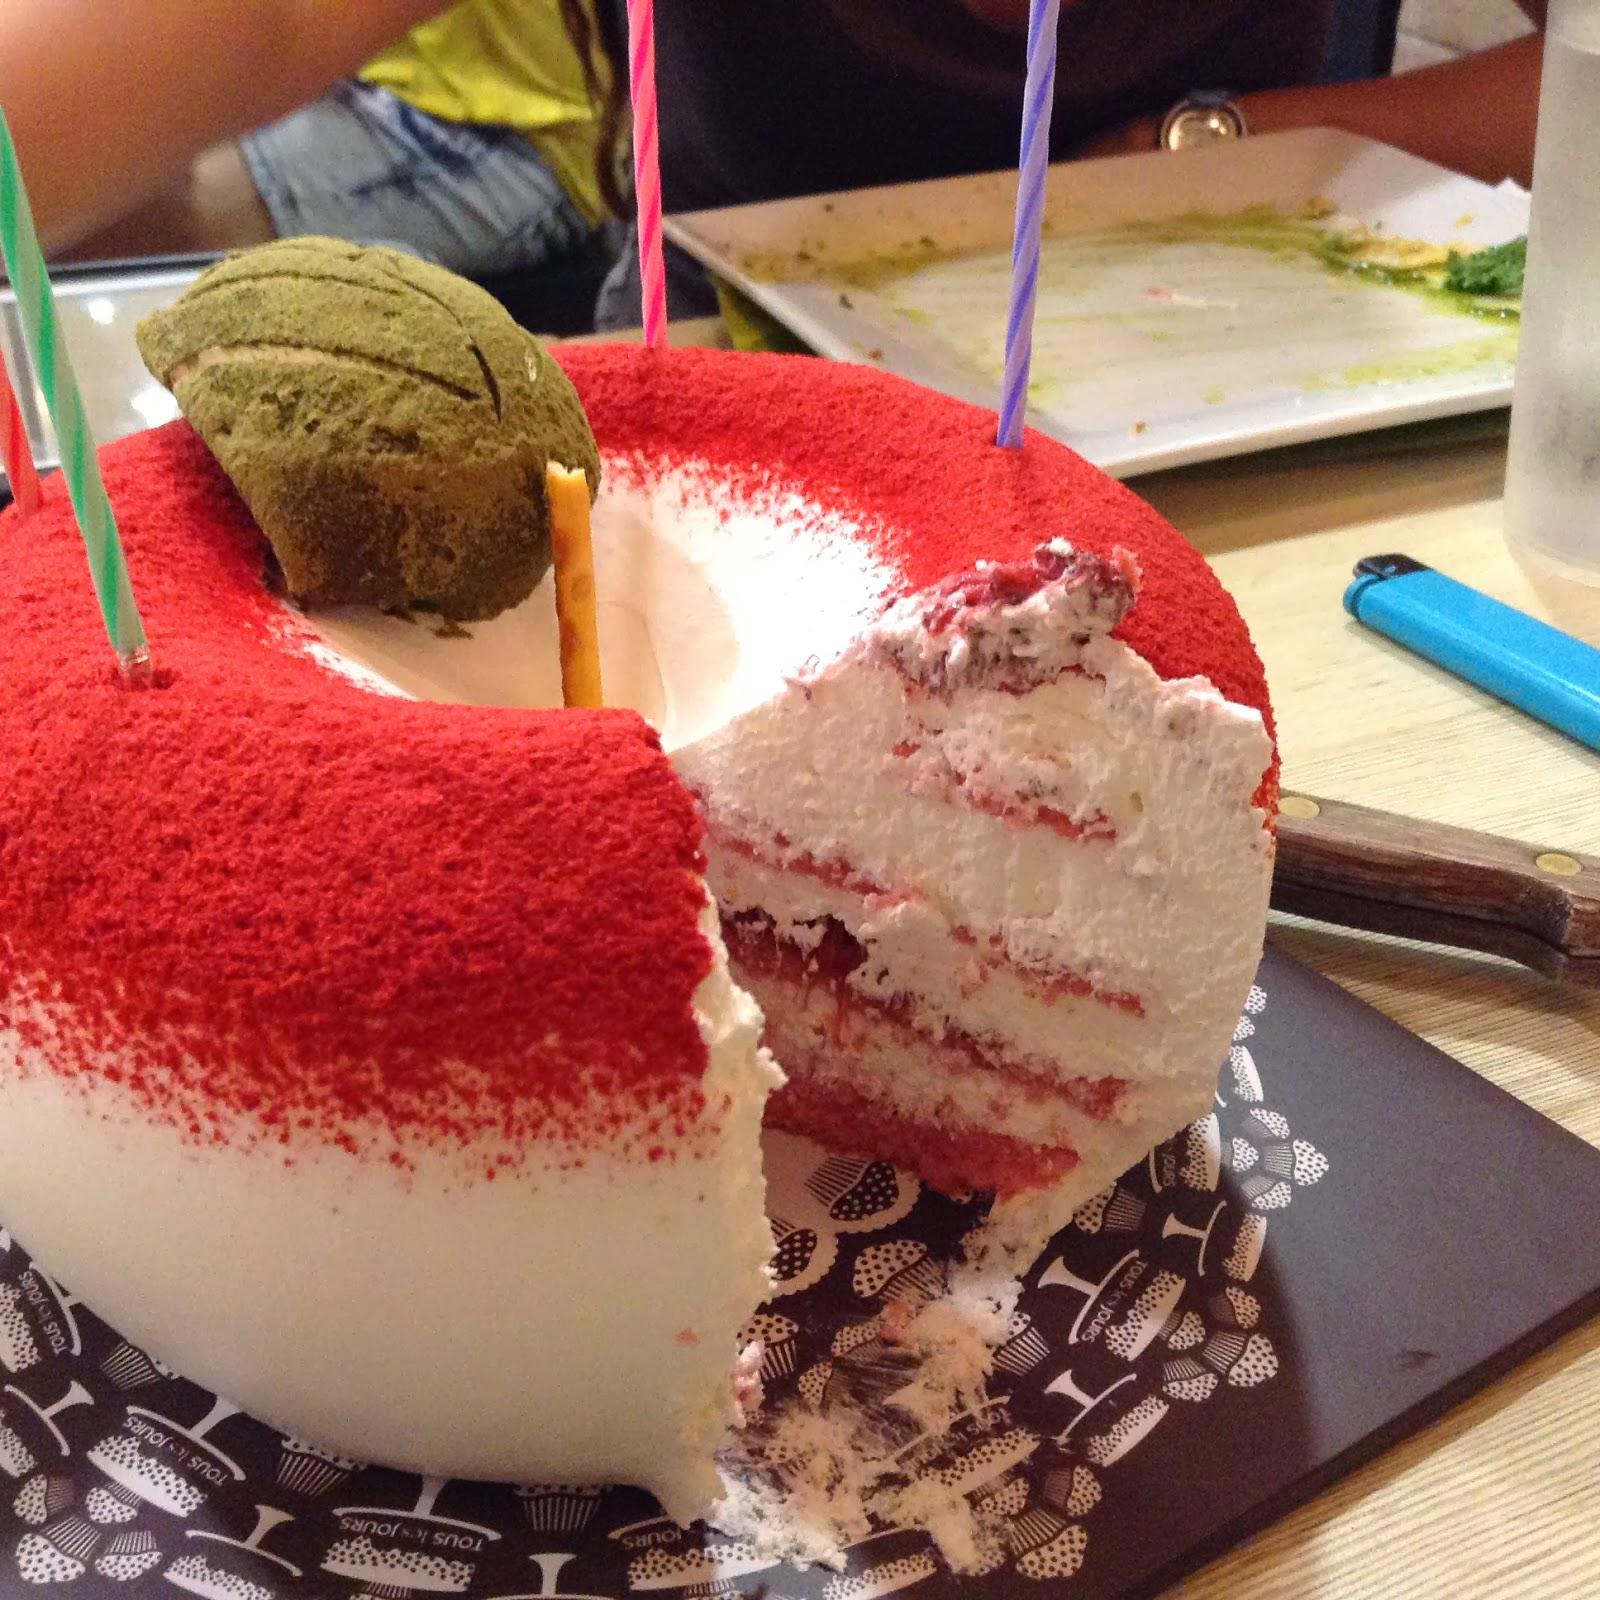 Closer look at Tous les Jours cake